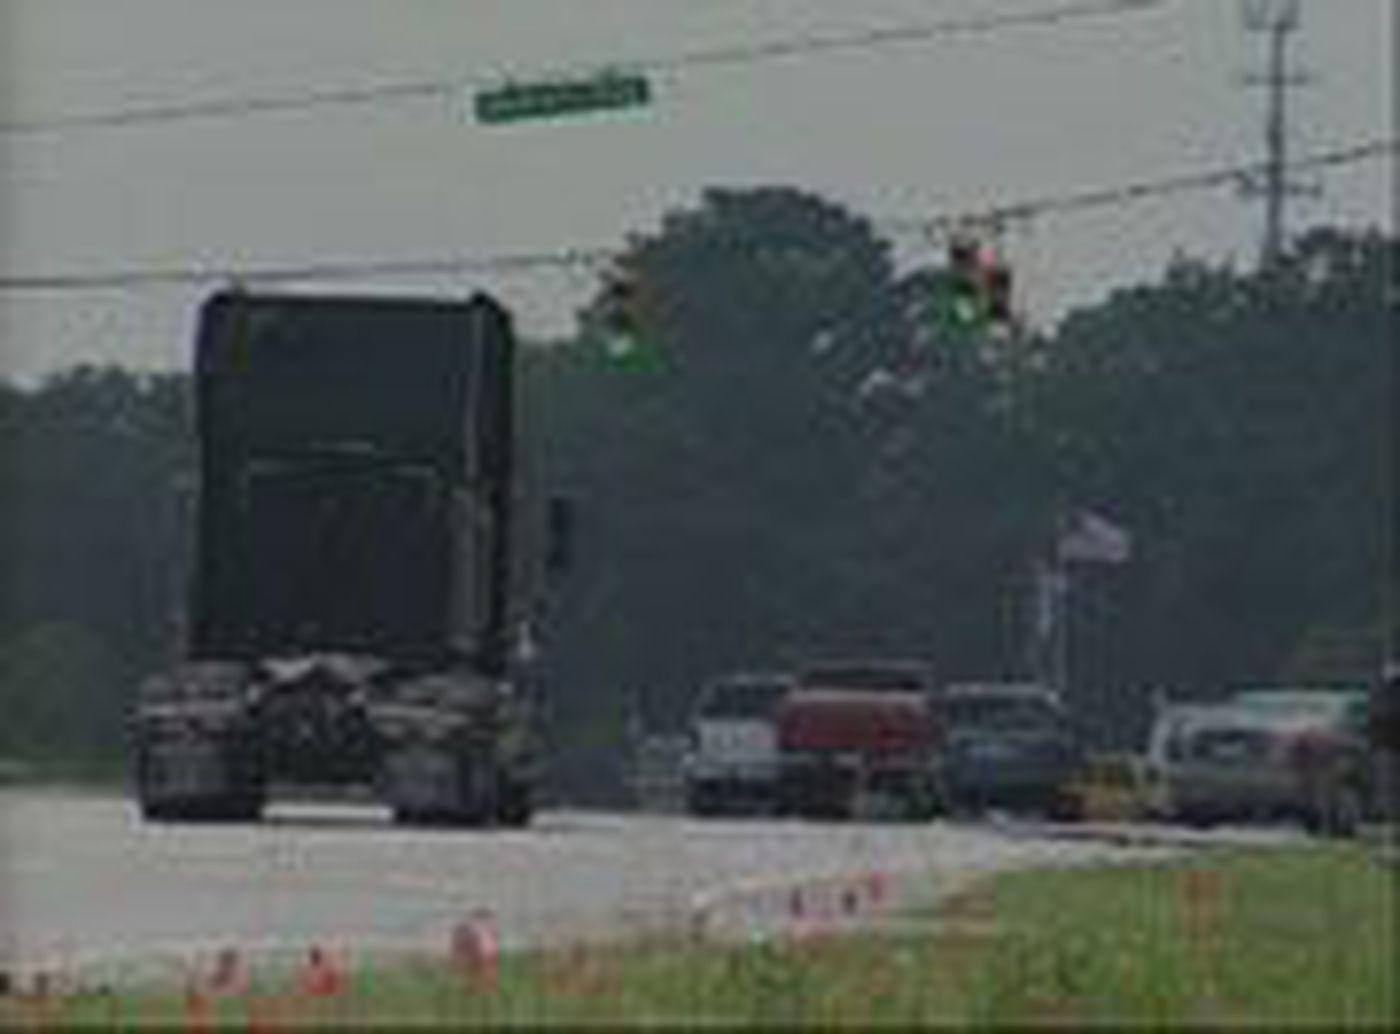 Traffic light upgrade on Highway 278 coming soon